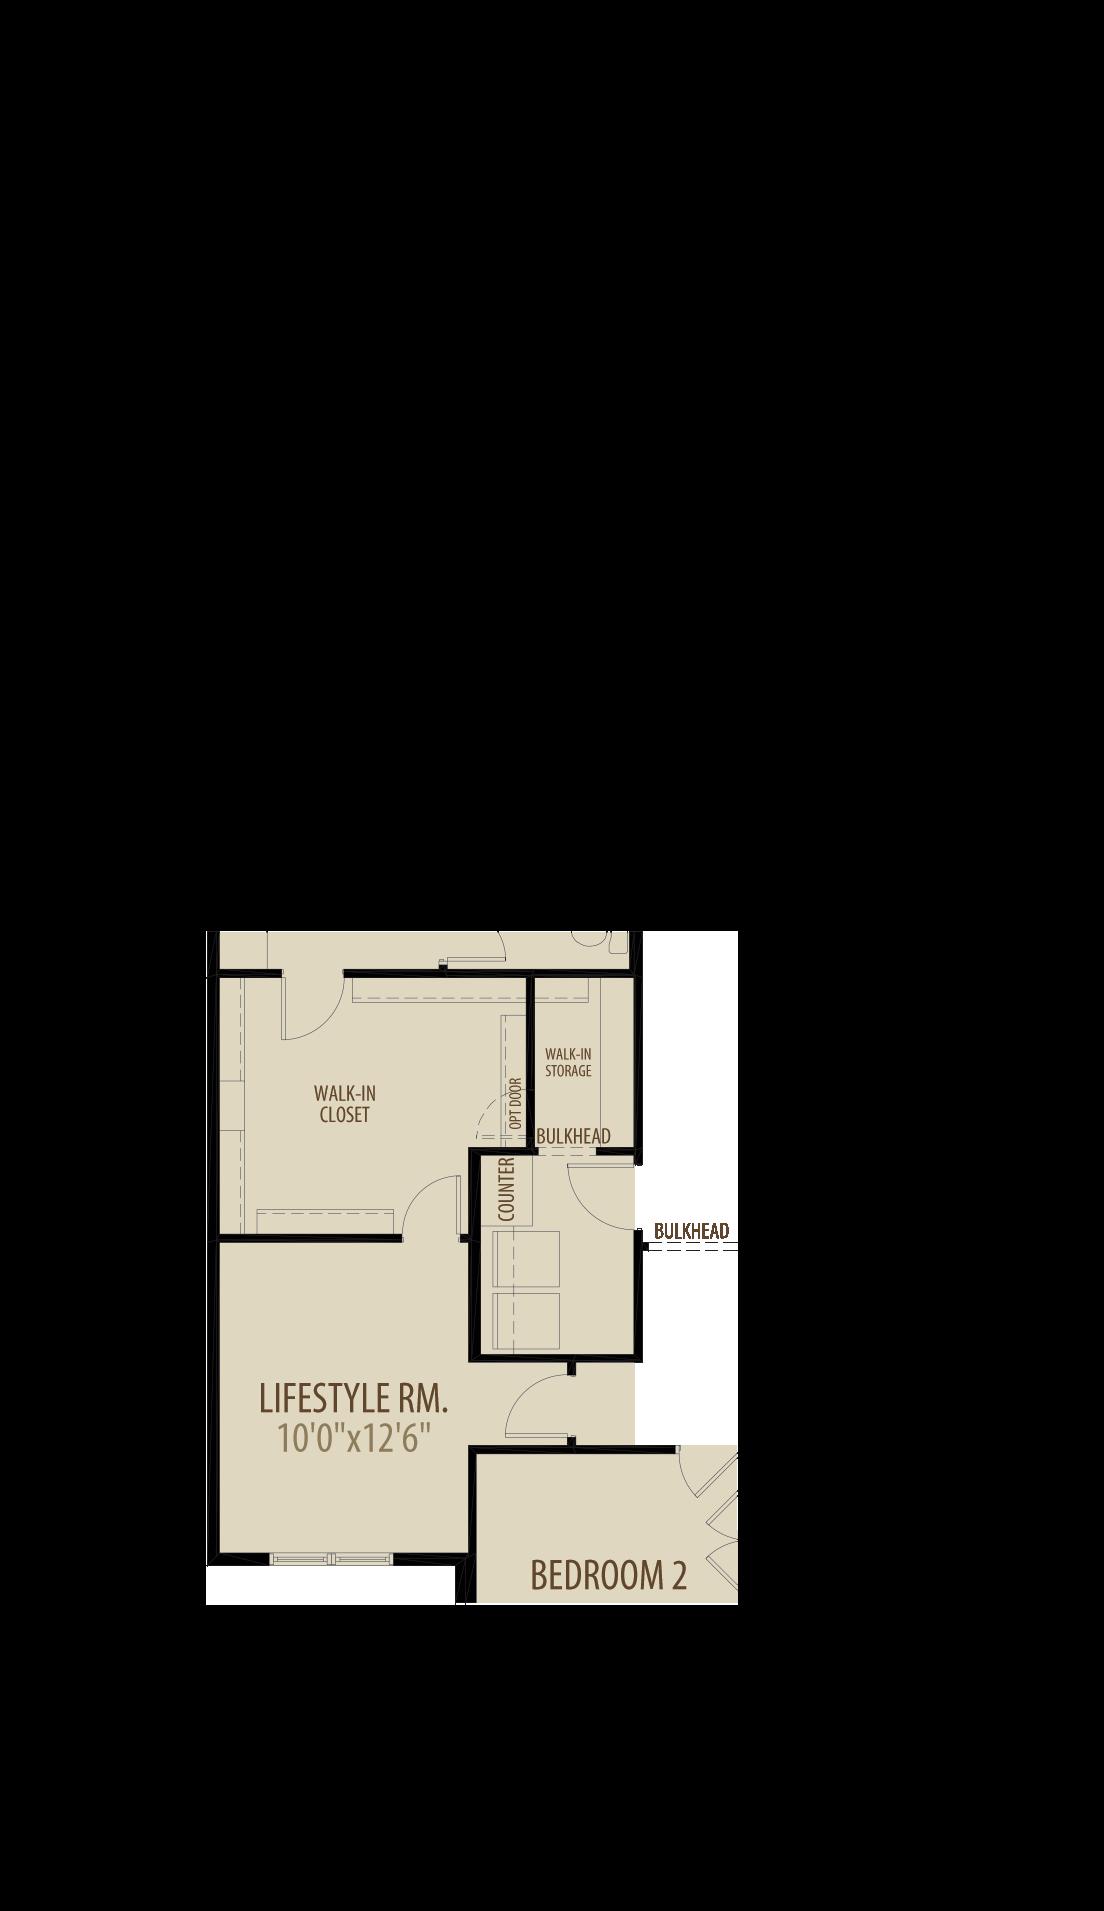 Option 3 Lifestyle Room